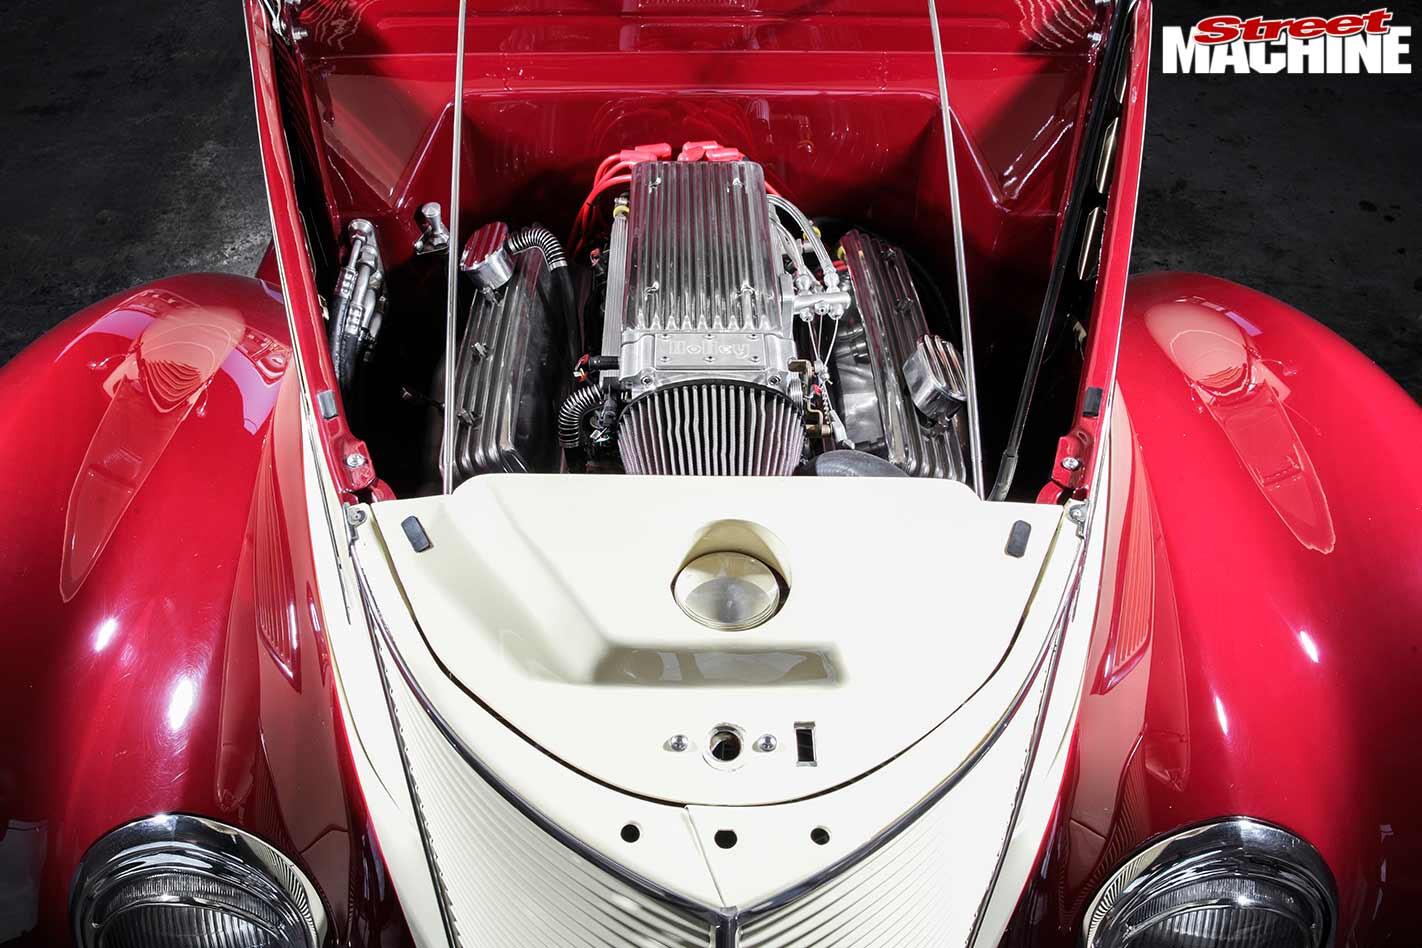 Ford Cabriolet engine bay